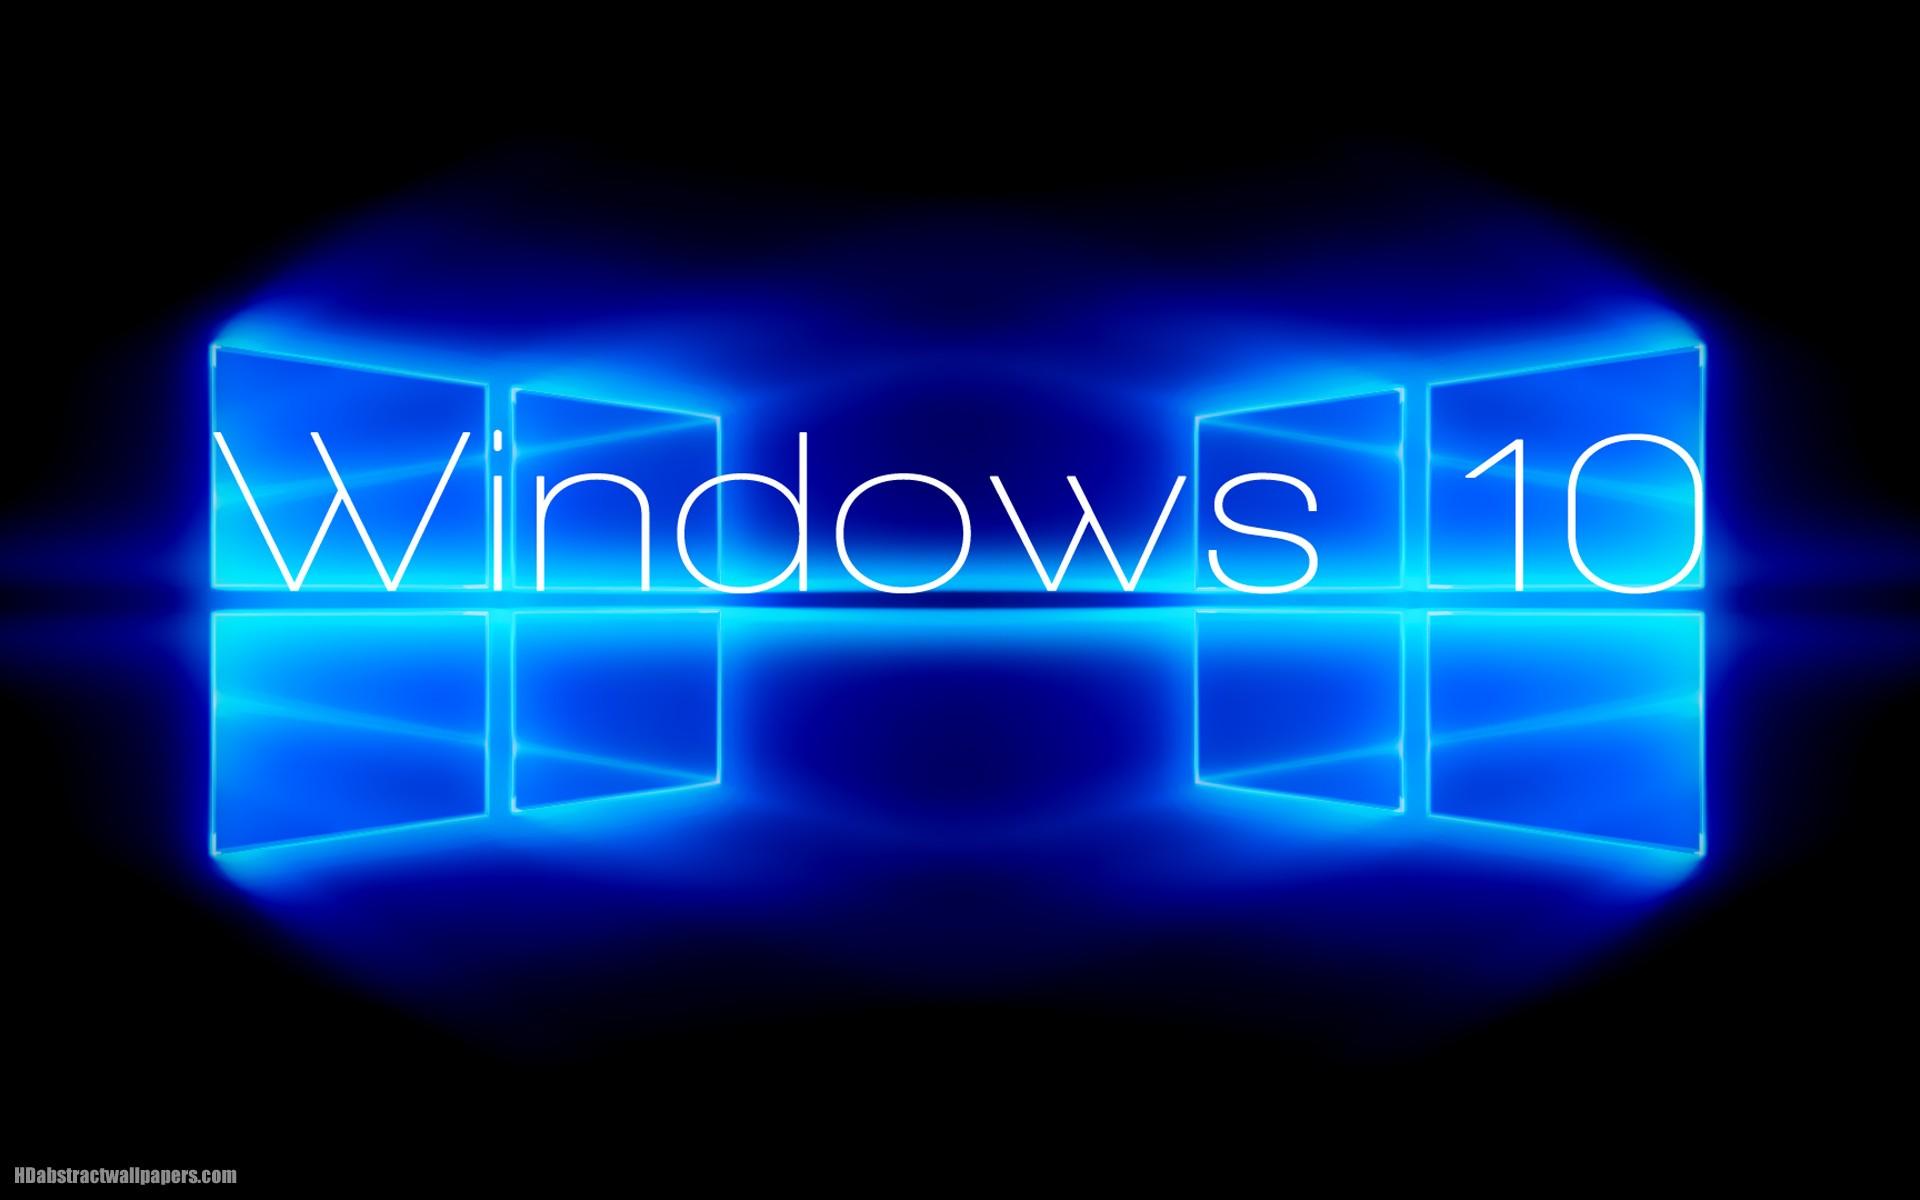 Windows 10 Pro Wallpaper Hd Windows 10 Free Wallpaper